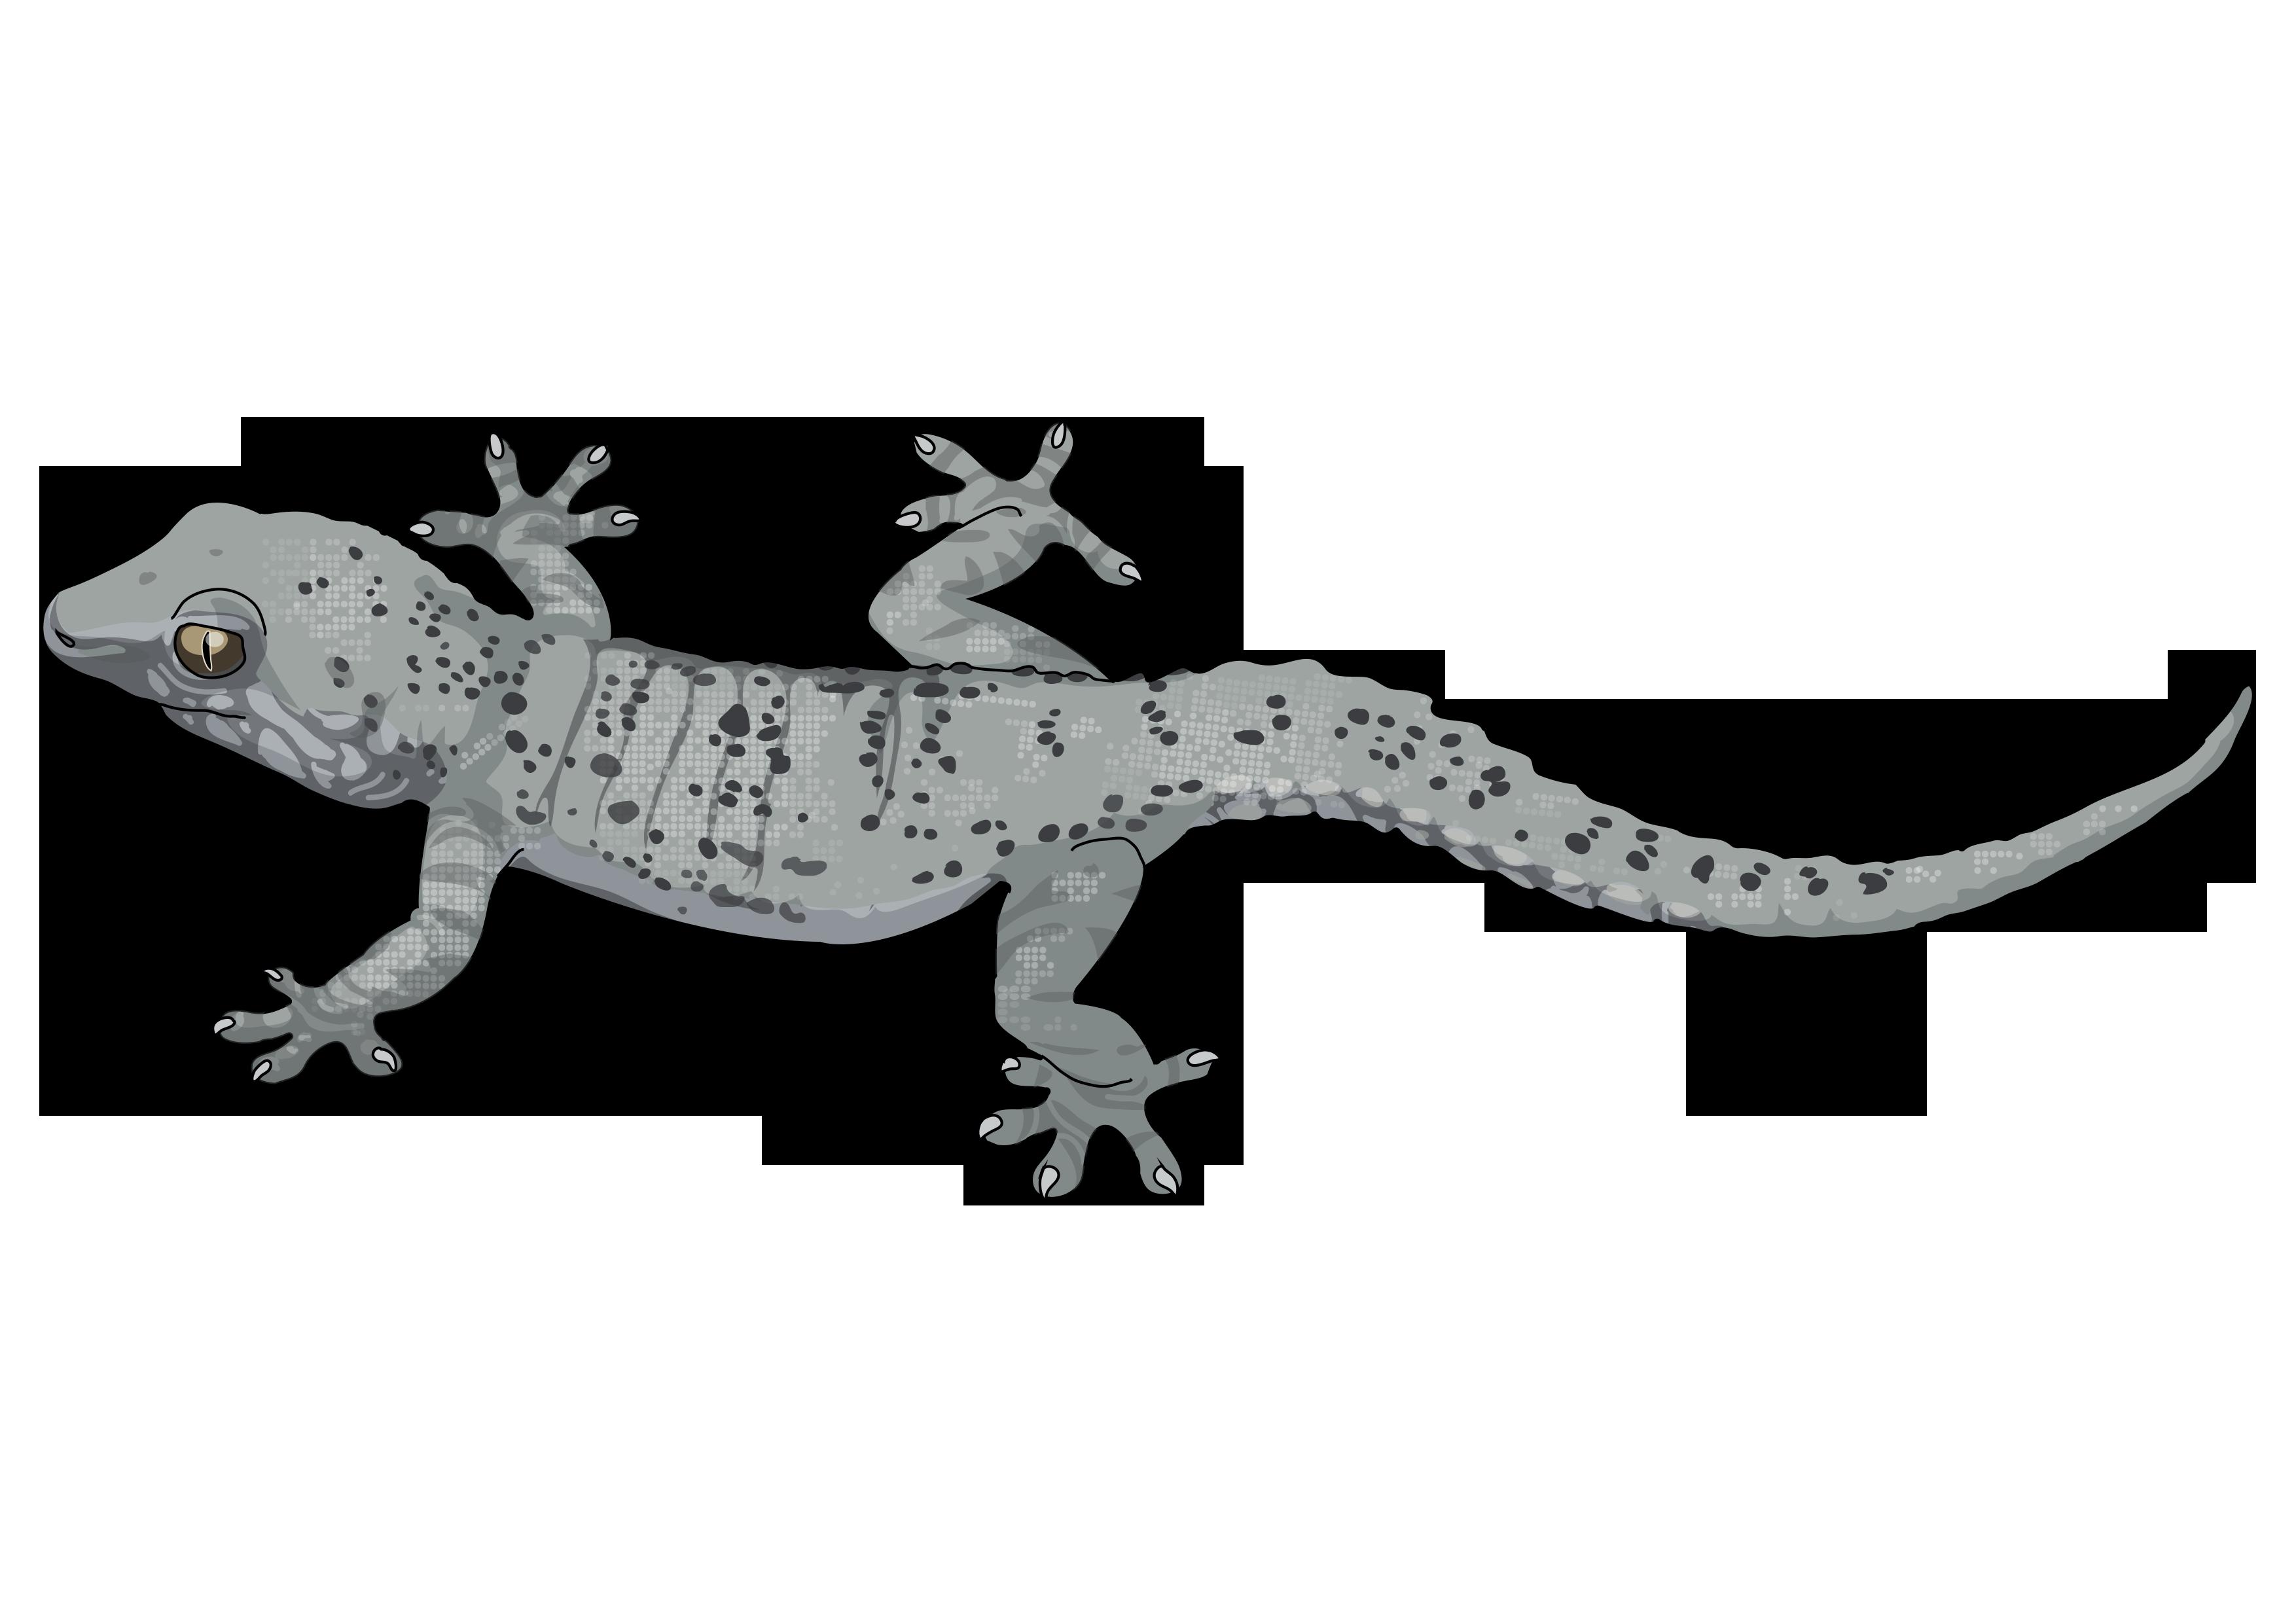 perenquen comun png. Gecko clipart lagartija